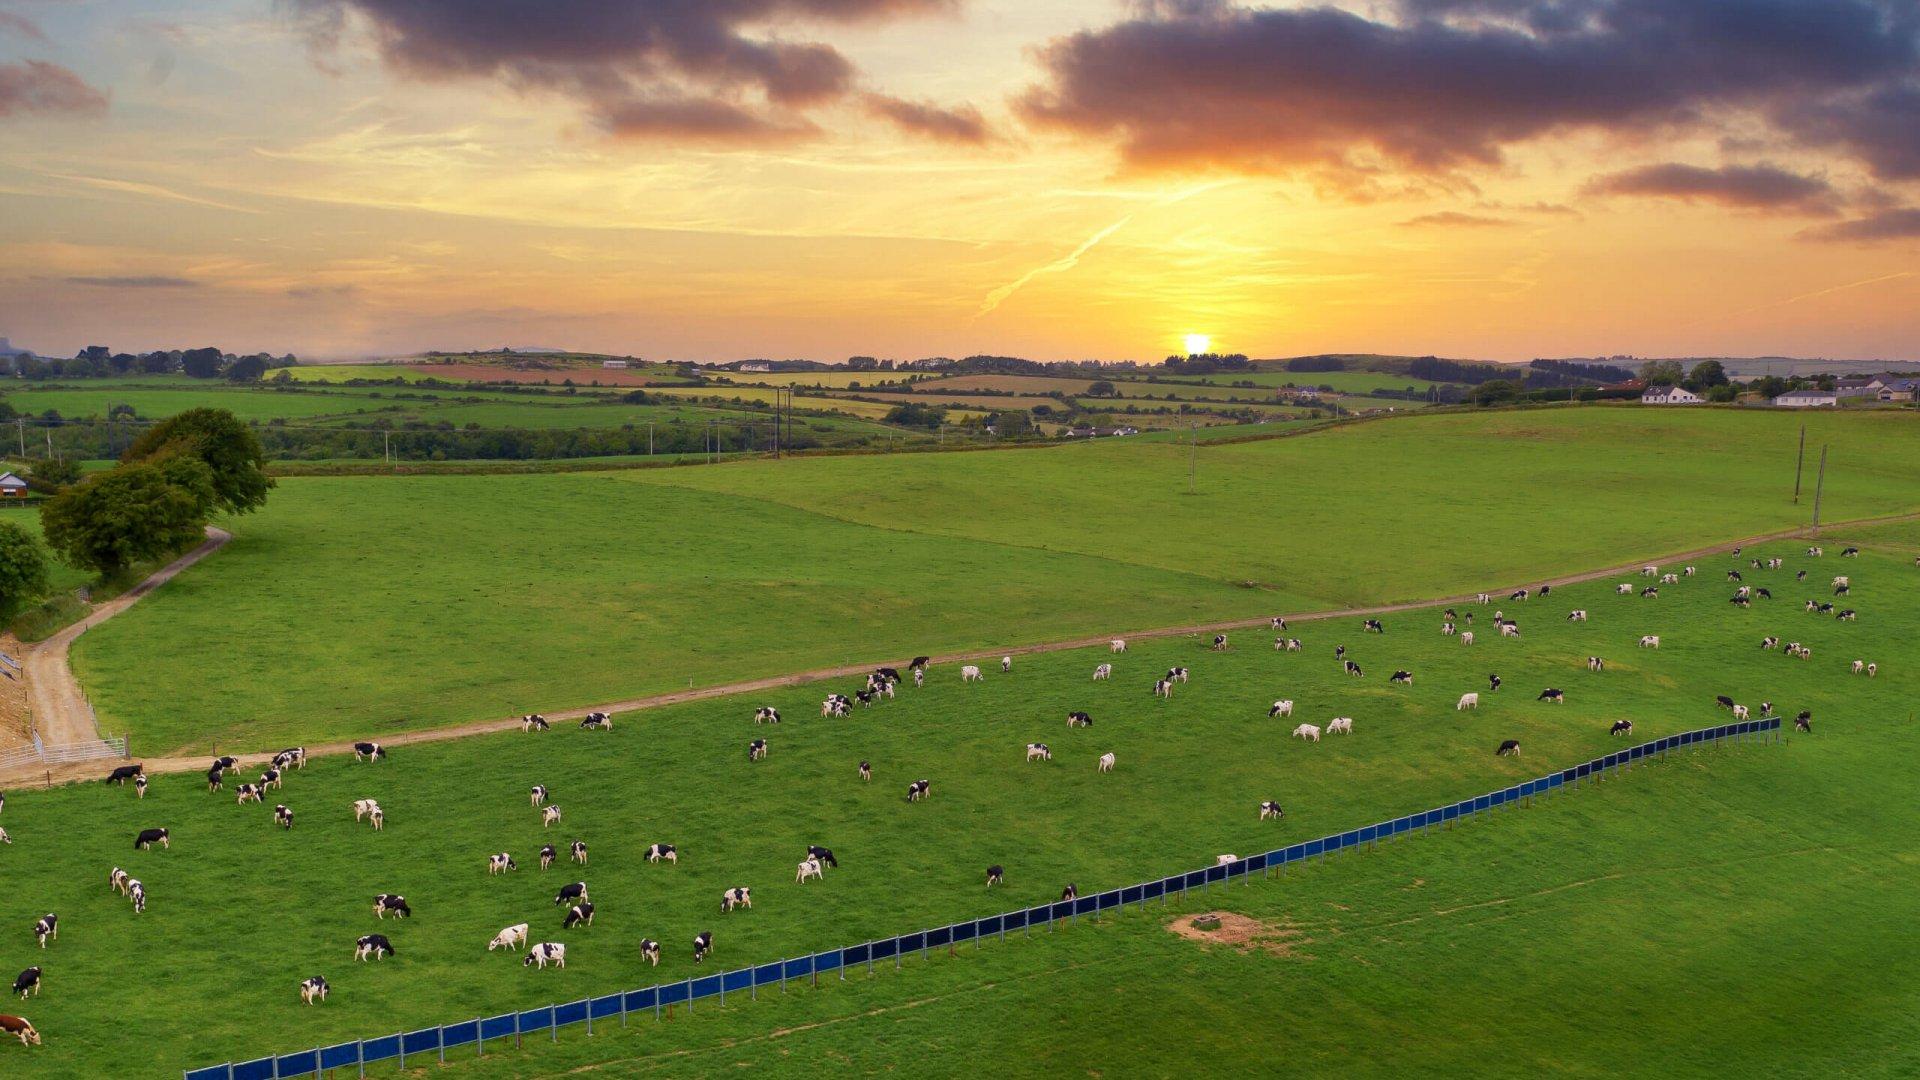 Solarzaun / Solar fence in Waterford, Ireland (Sunstream Energy Ltd.)